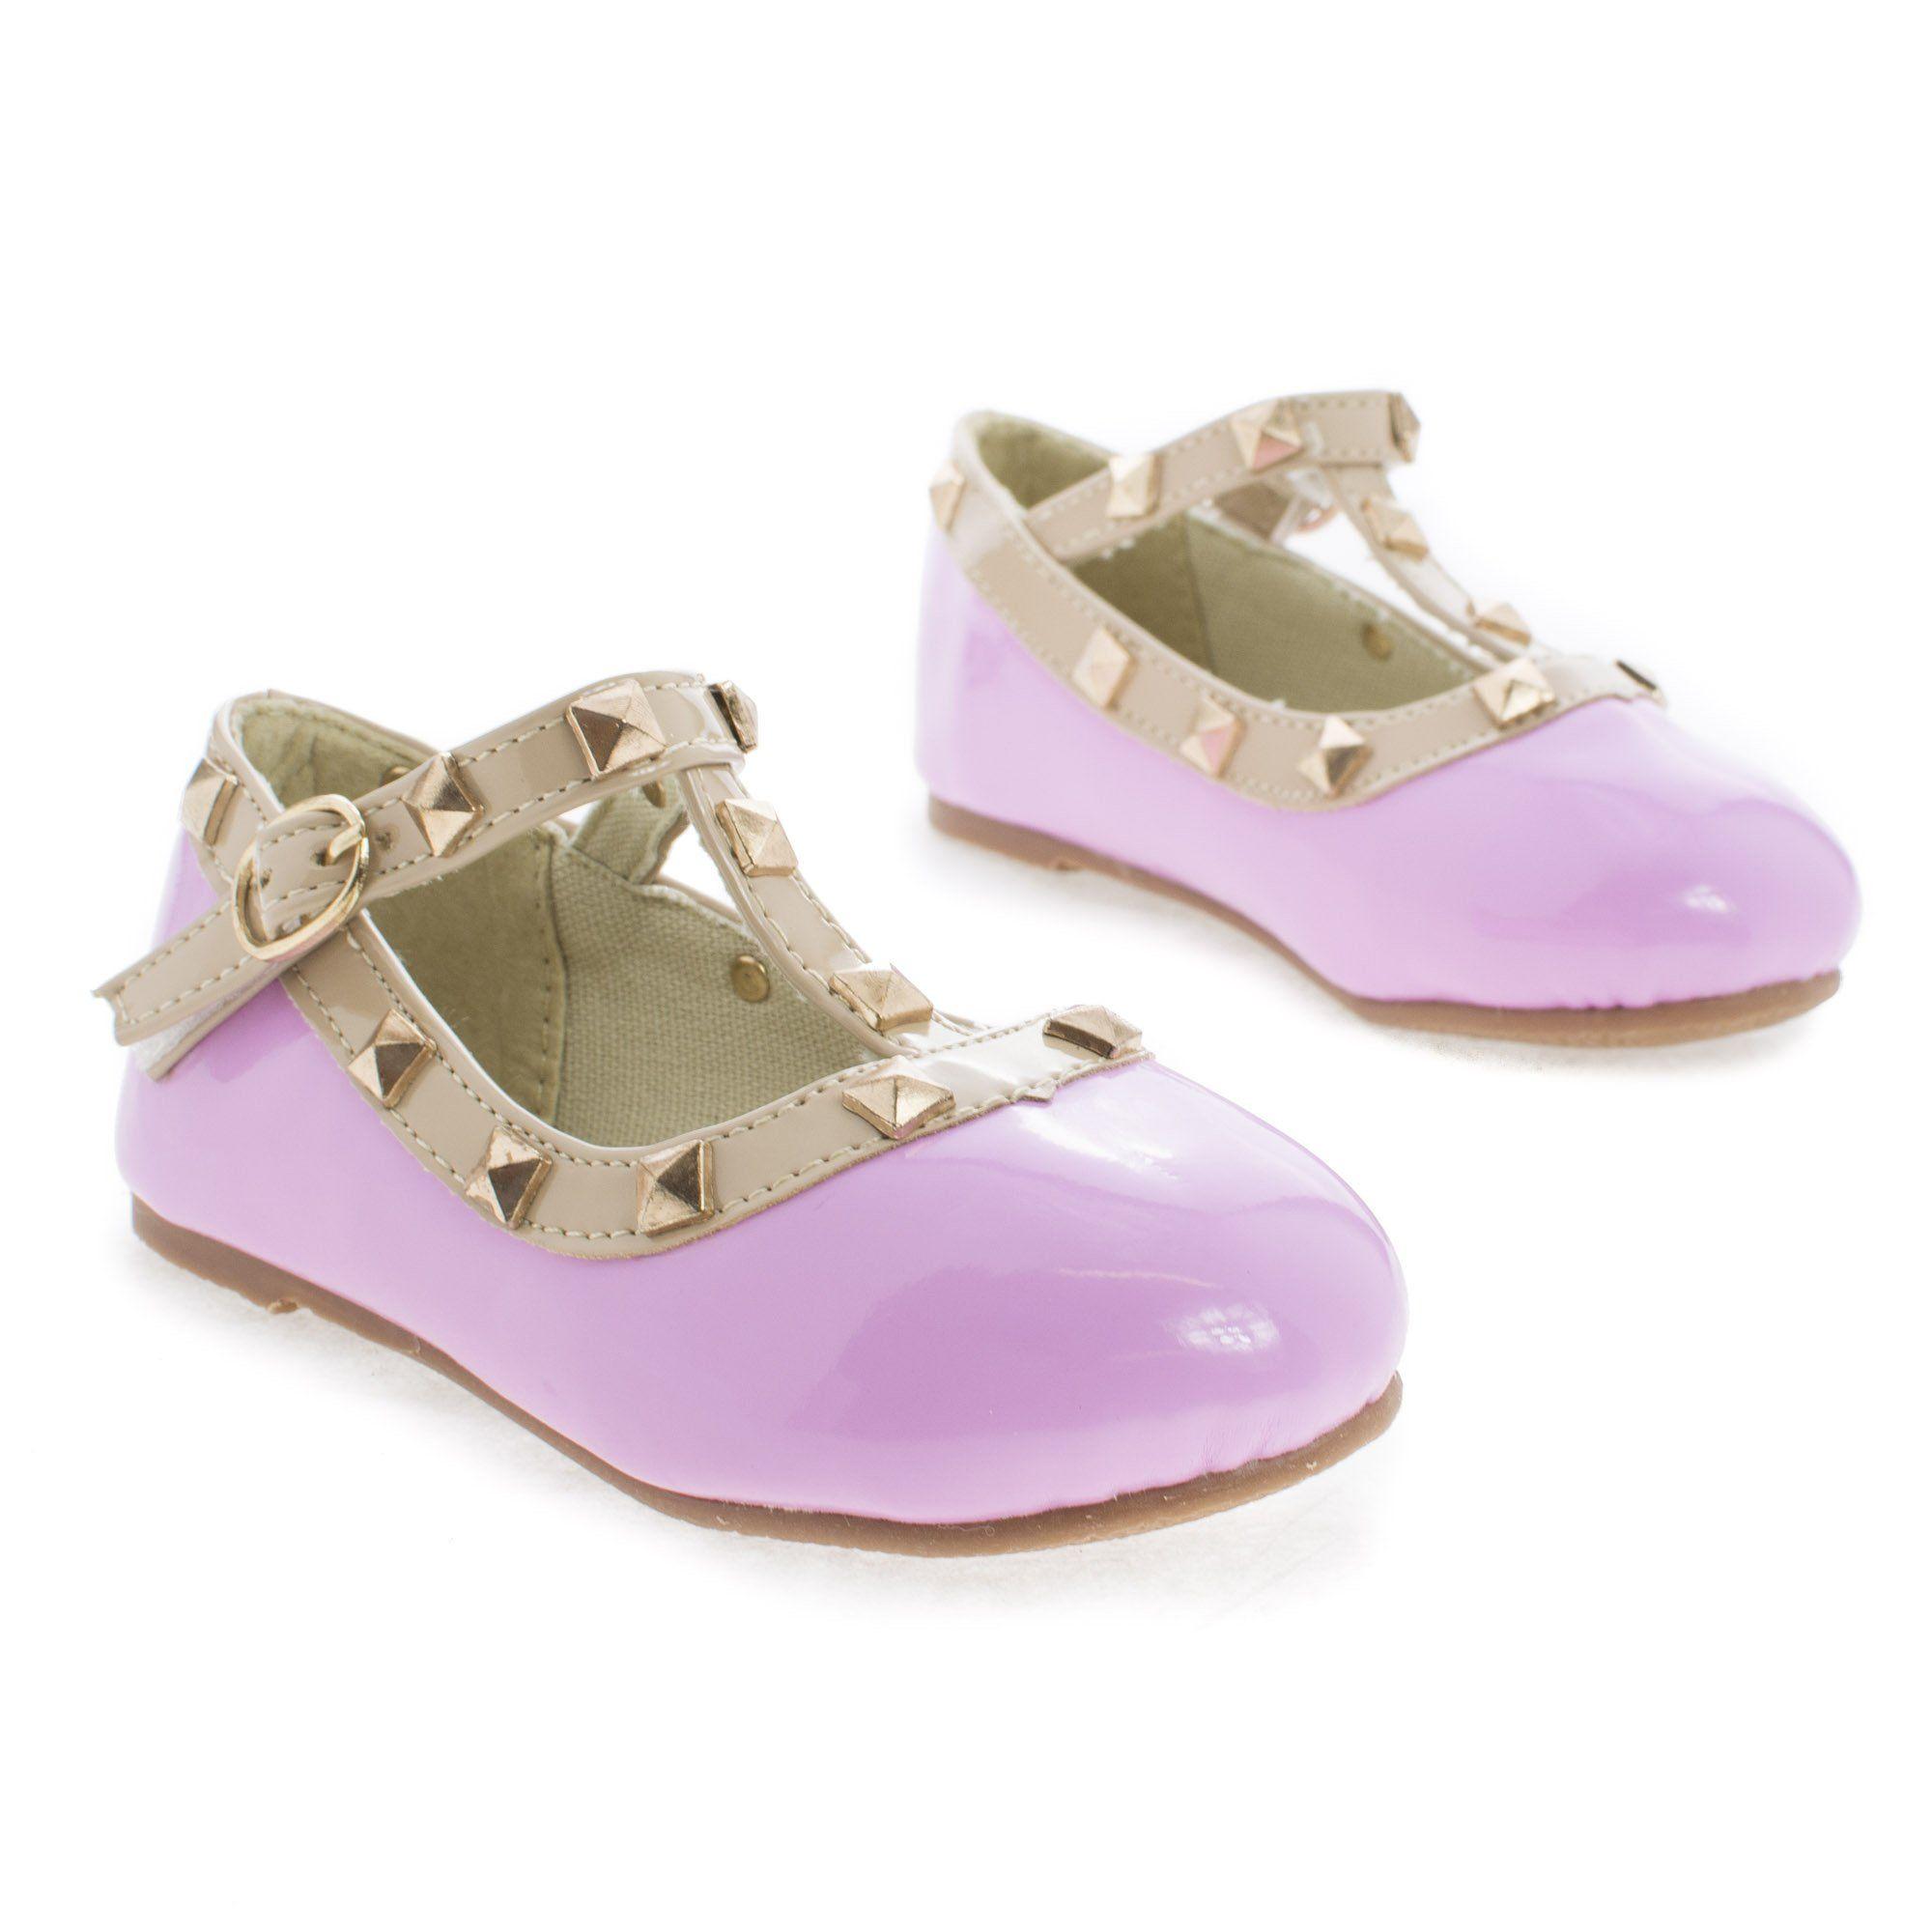 Clinky Infant Girl Round Toe Mary Jane Studded Slip On Flats